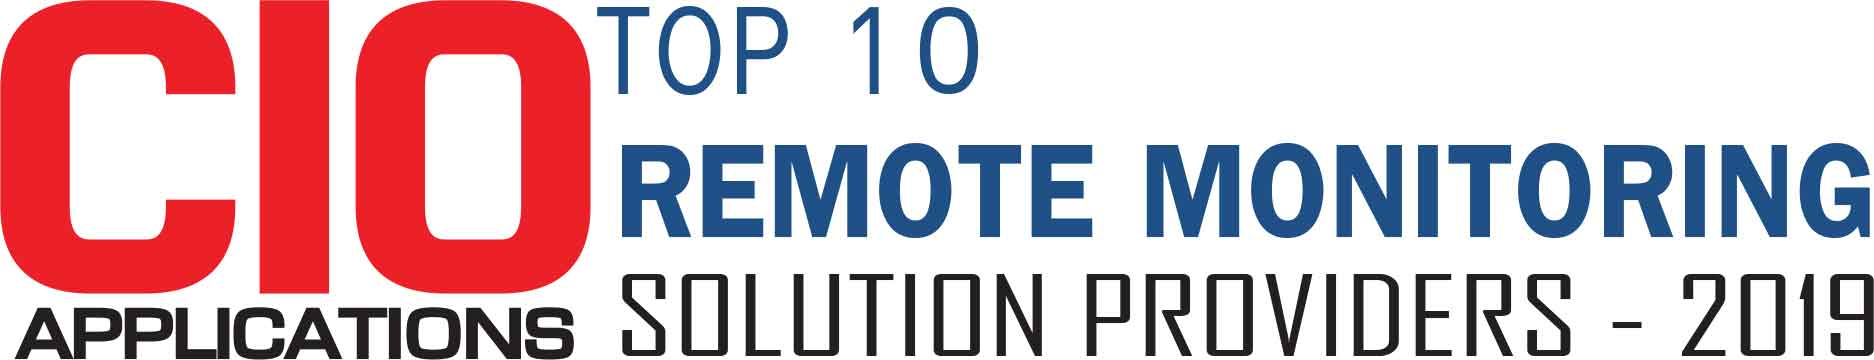 Top Remote Monitoring Companies